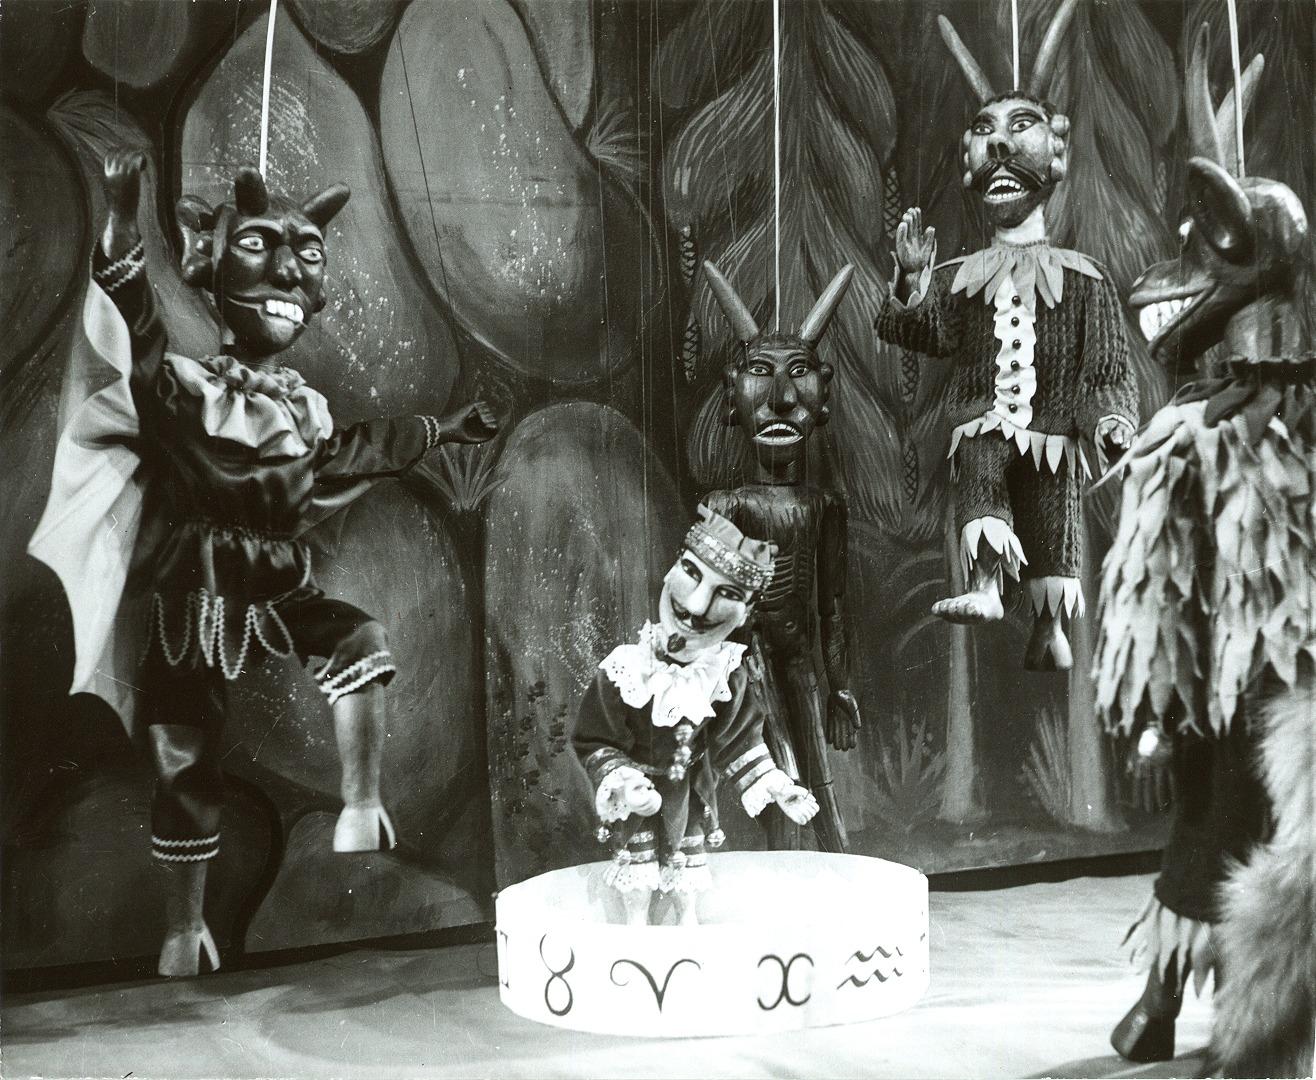 <em>Johan doktor Faust</em> (1968) por Uměle<em>c</em>ká s<em>c</em>éna Říše loutek (Praga, Che<em>c</em>oslovaquia), puesta en es<em>c</em>ena y es<em>c</em>enografía: Bohumír Koubek. Fotografía cortesía de Archivo de Umělecká scéna Říše loutek